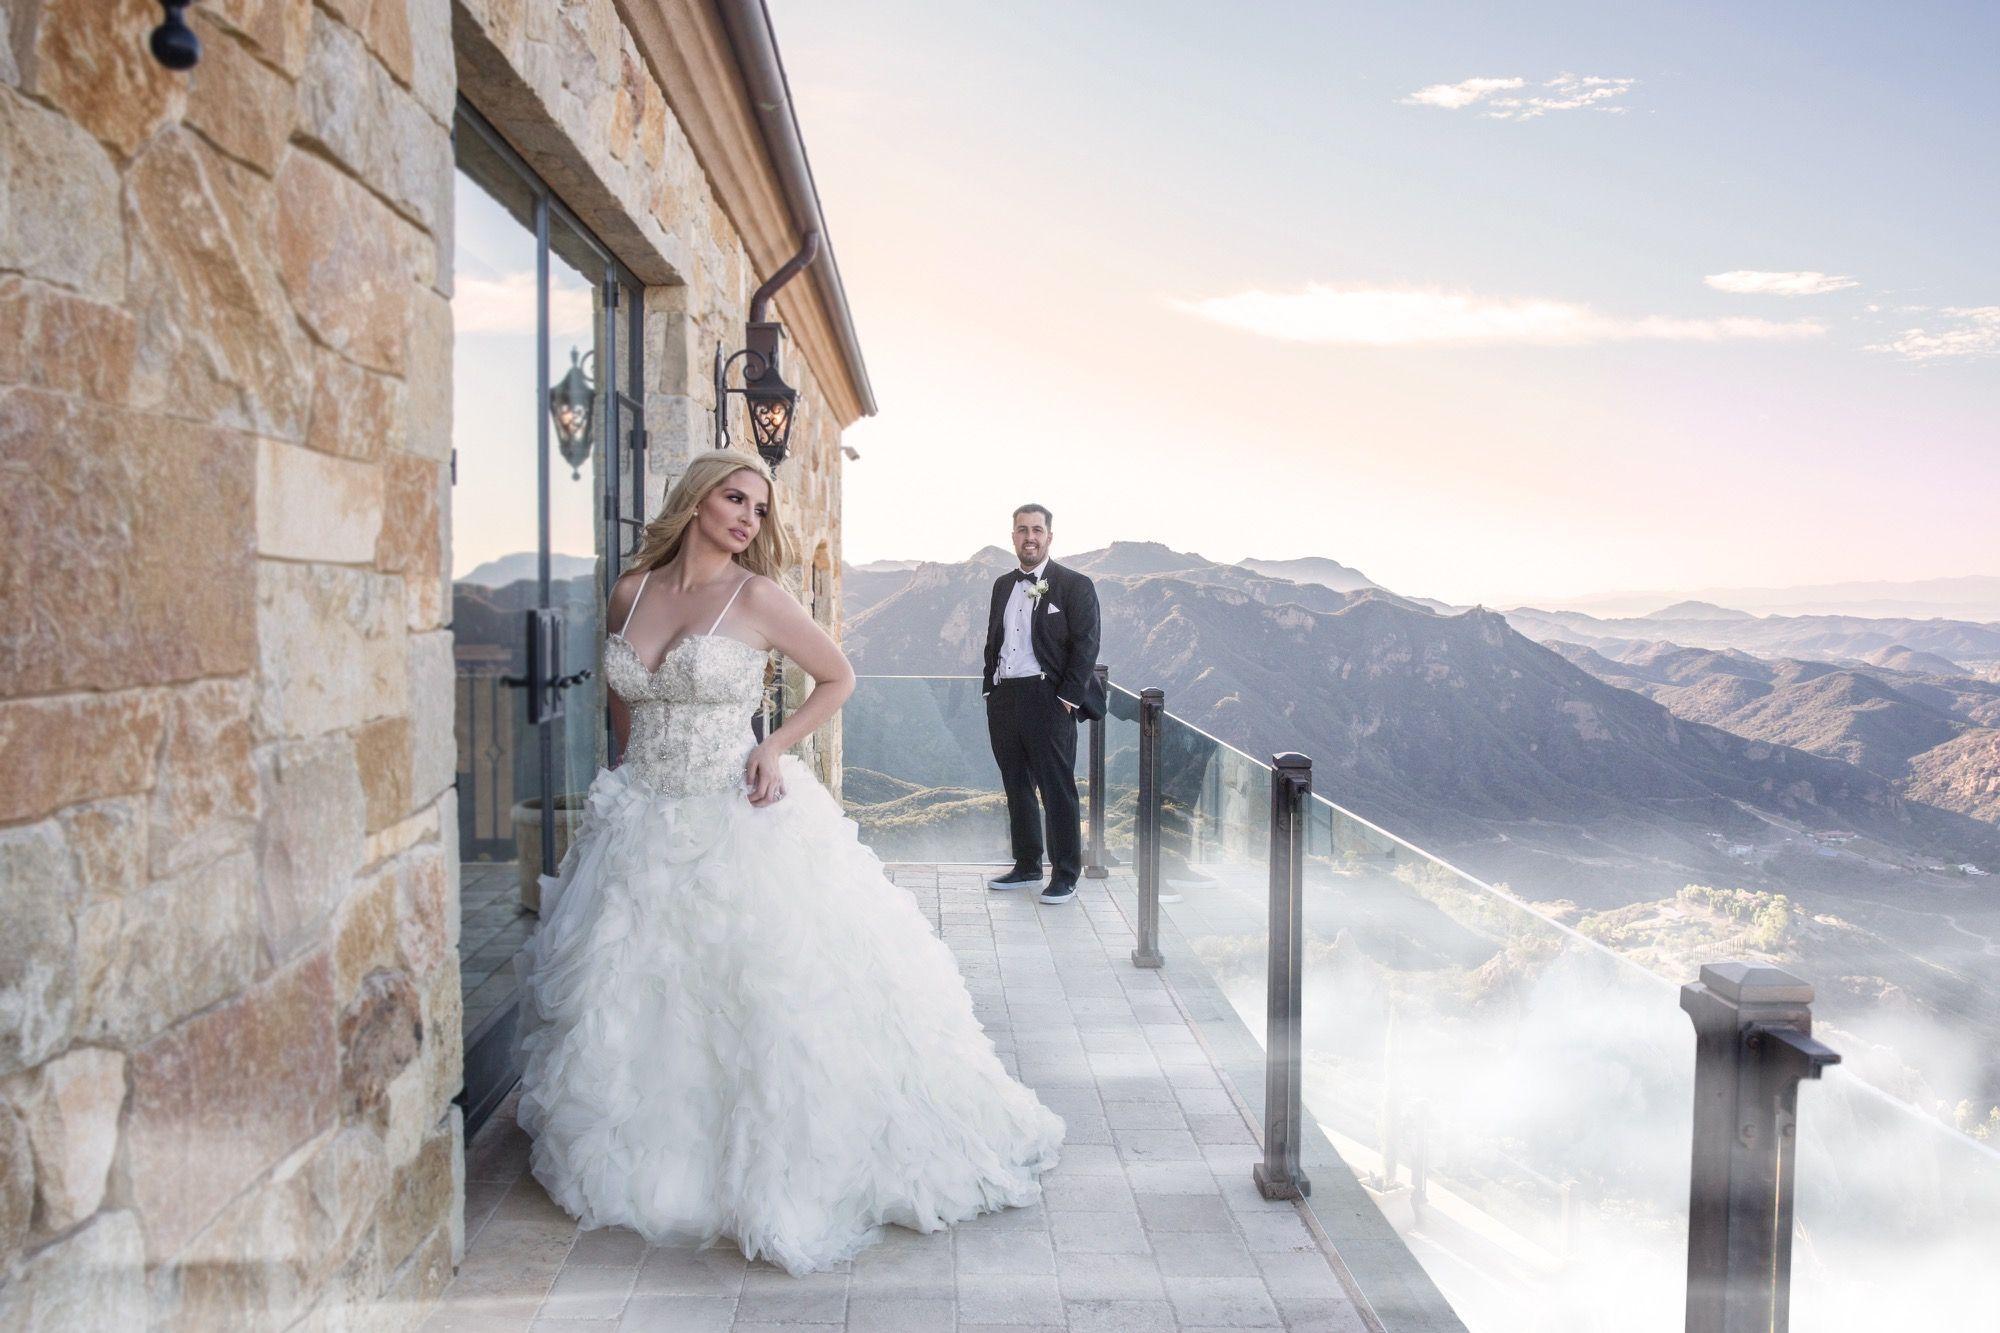 home | breann mcgregor #weddingpictures #weddingideas